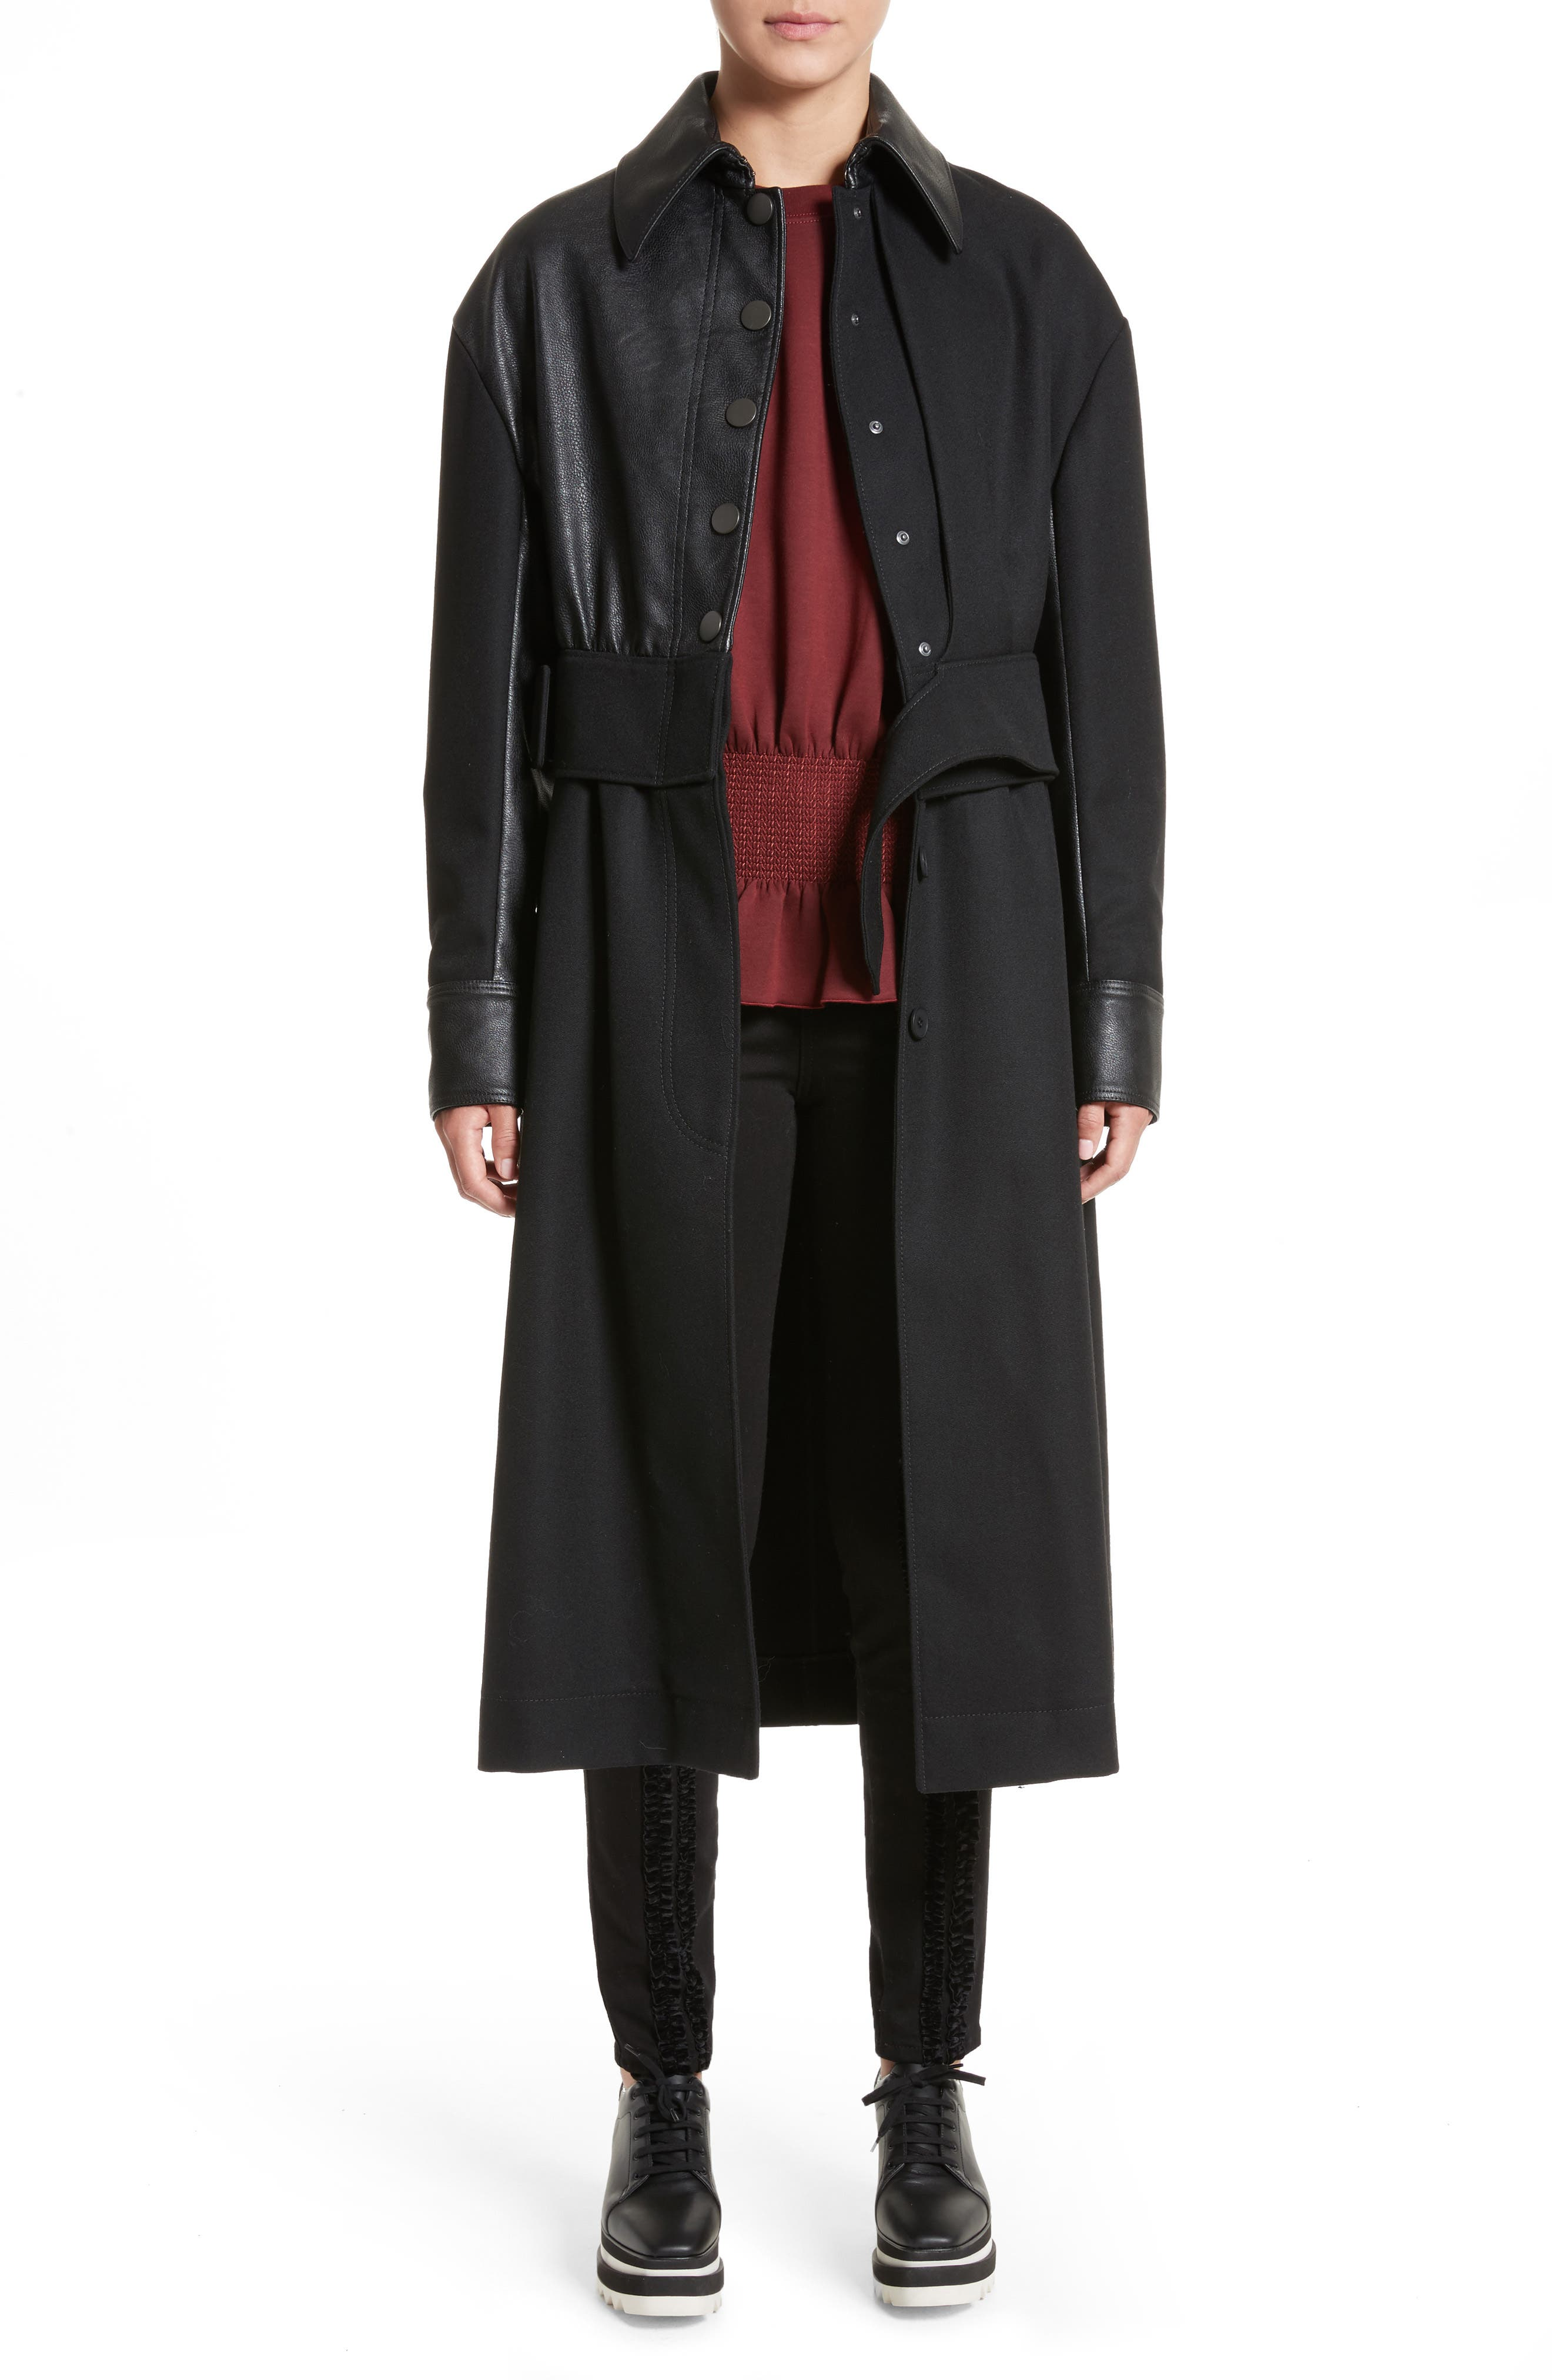 Eden Alter Leather Trim Wool Coat,                             Main thumbnail 1, color,                             001